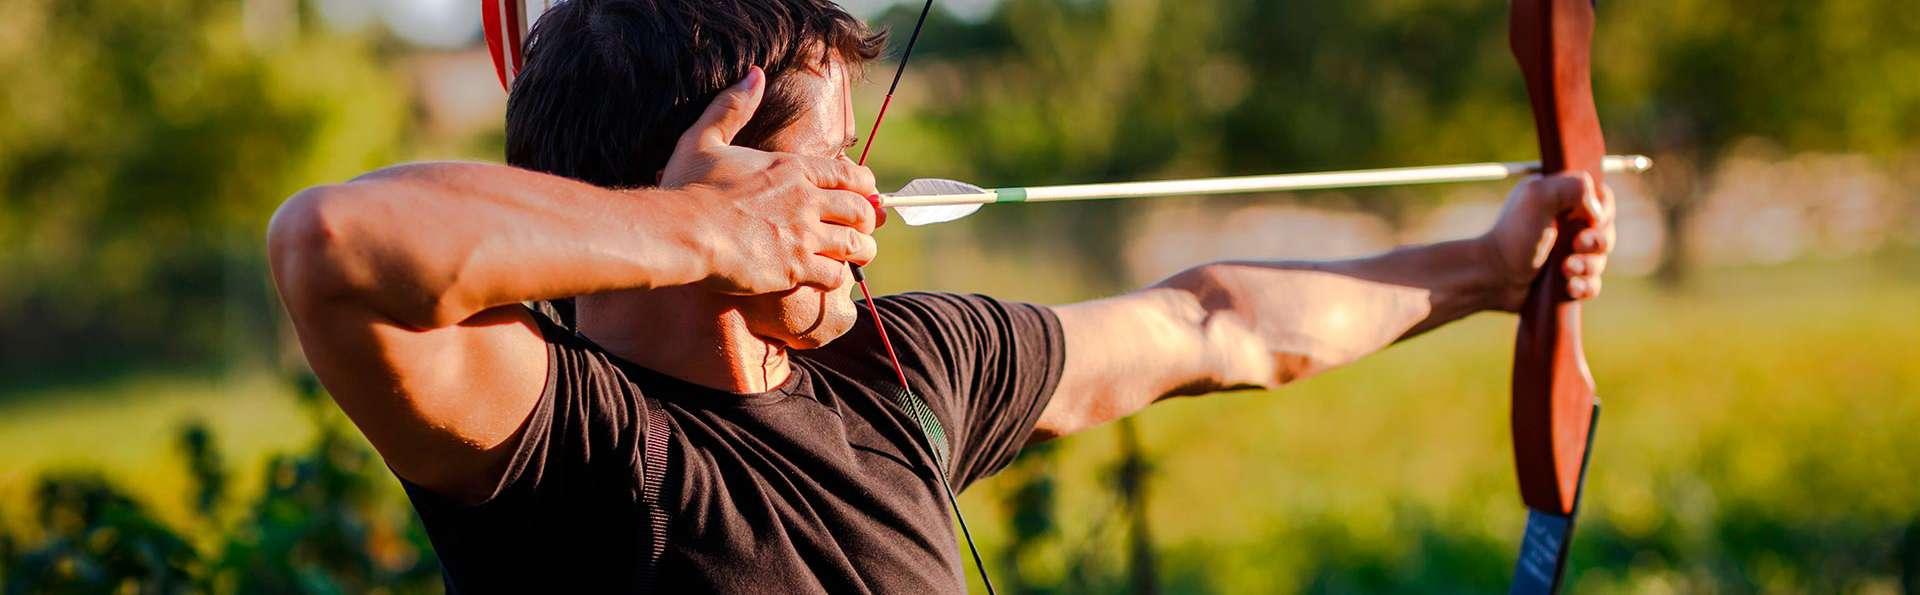 Escapada con clase de tiro con arco en entorno natural de Guadalajara